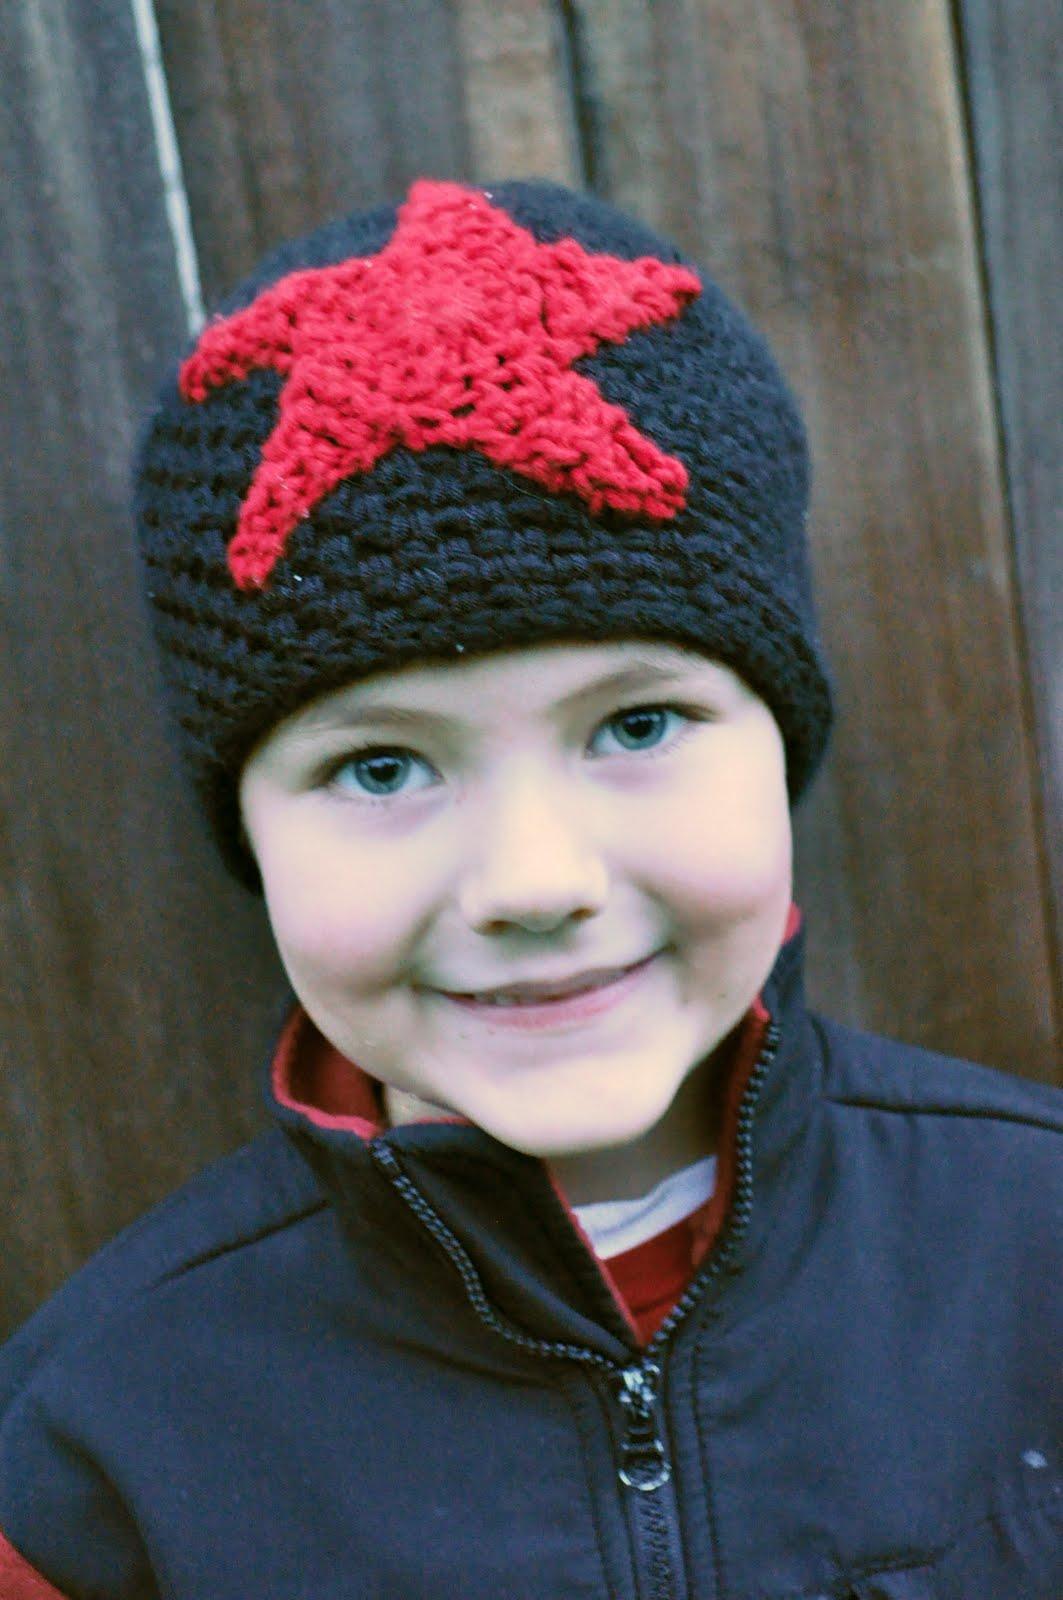 crochet hat patterns modelKnitting Gallery